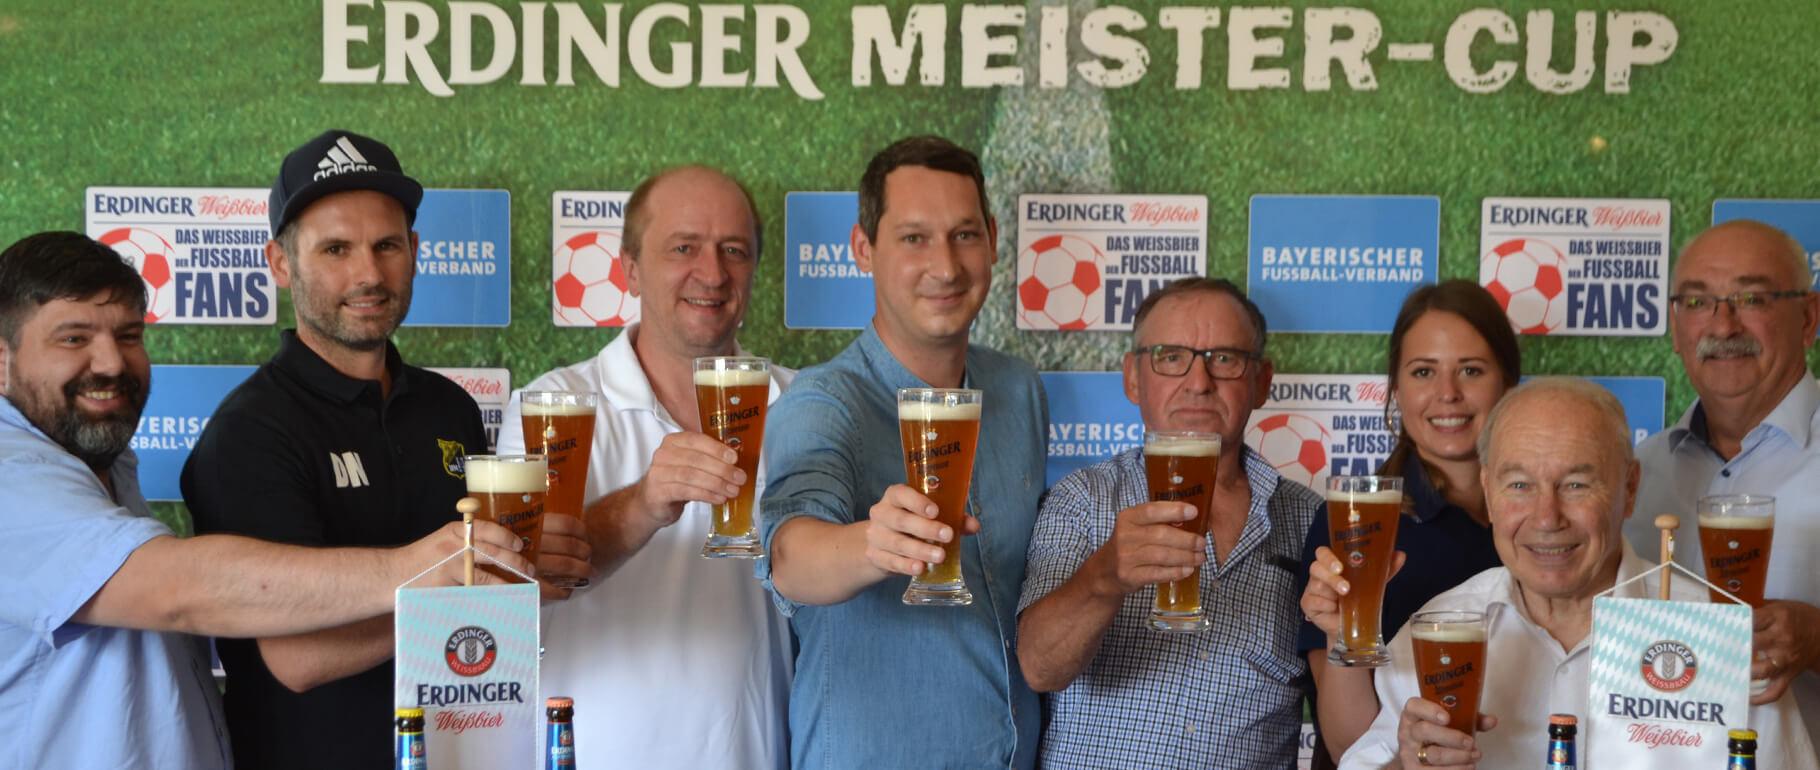 ERDINGER Meister-Cup 2019